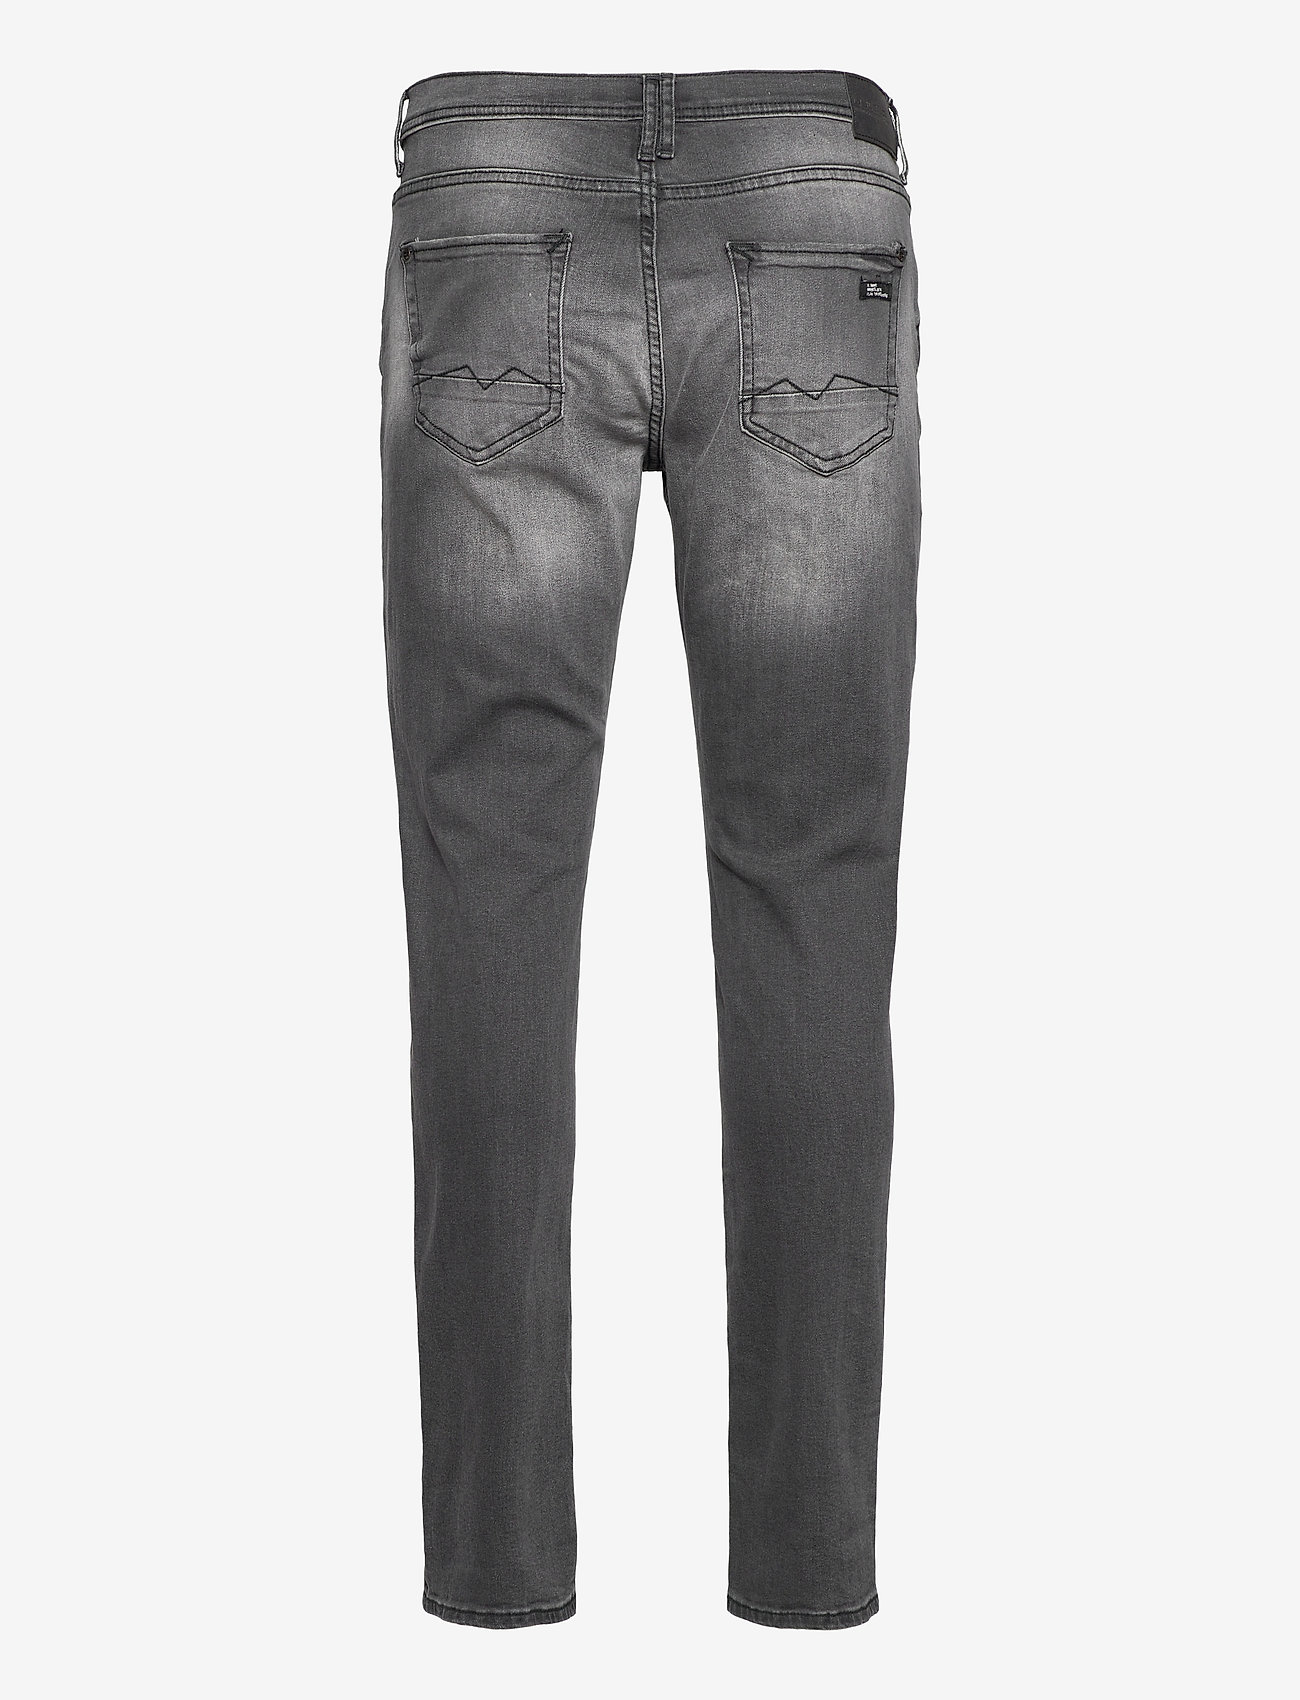 Blend Jeans - Clean - Jeans DENIM GREY - Menn Klær